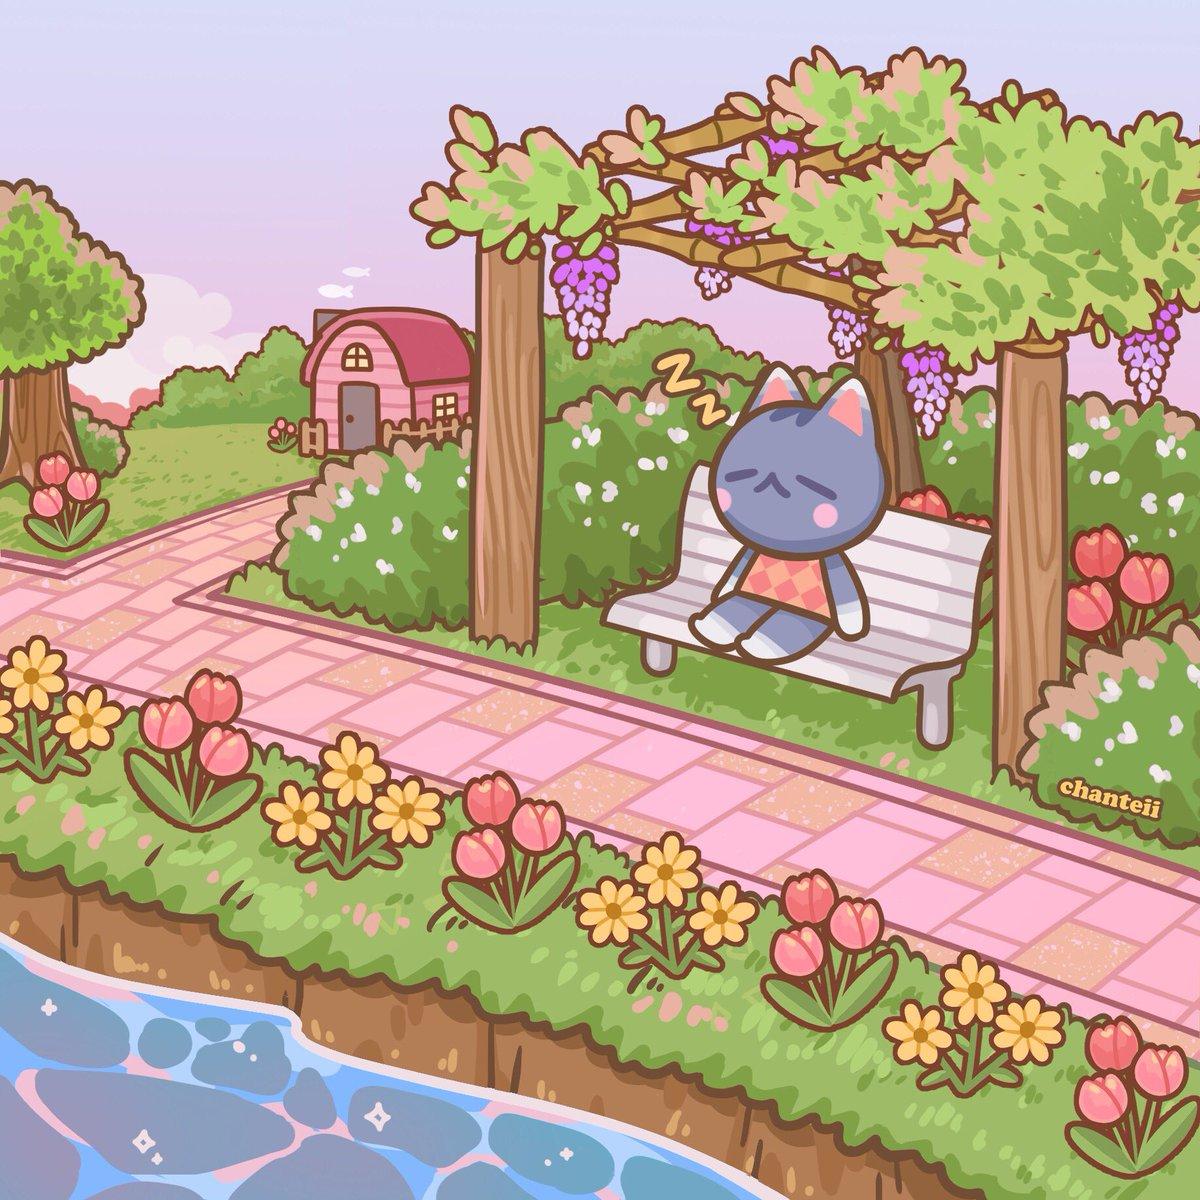 Agressive Grub Acnh On Twitter Animal Crossing Prints I